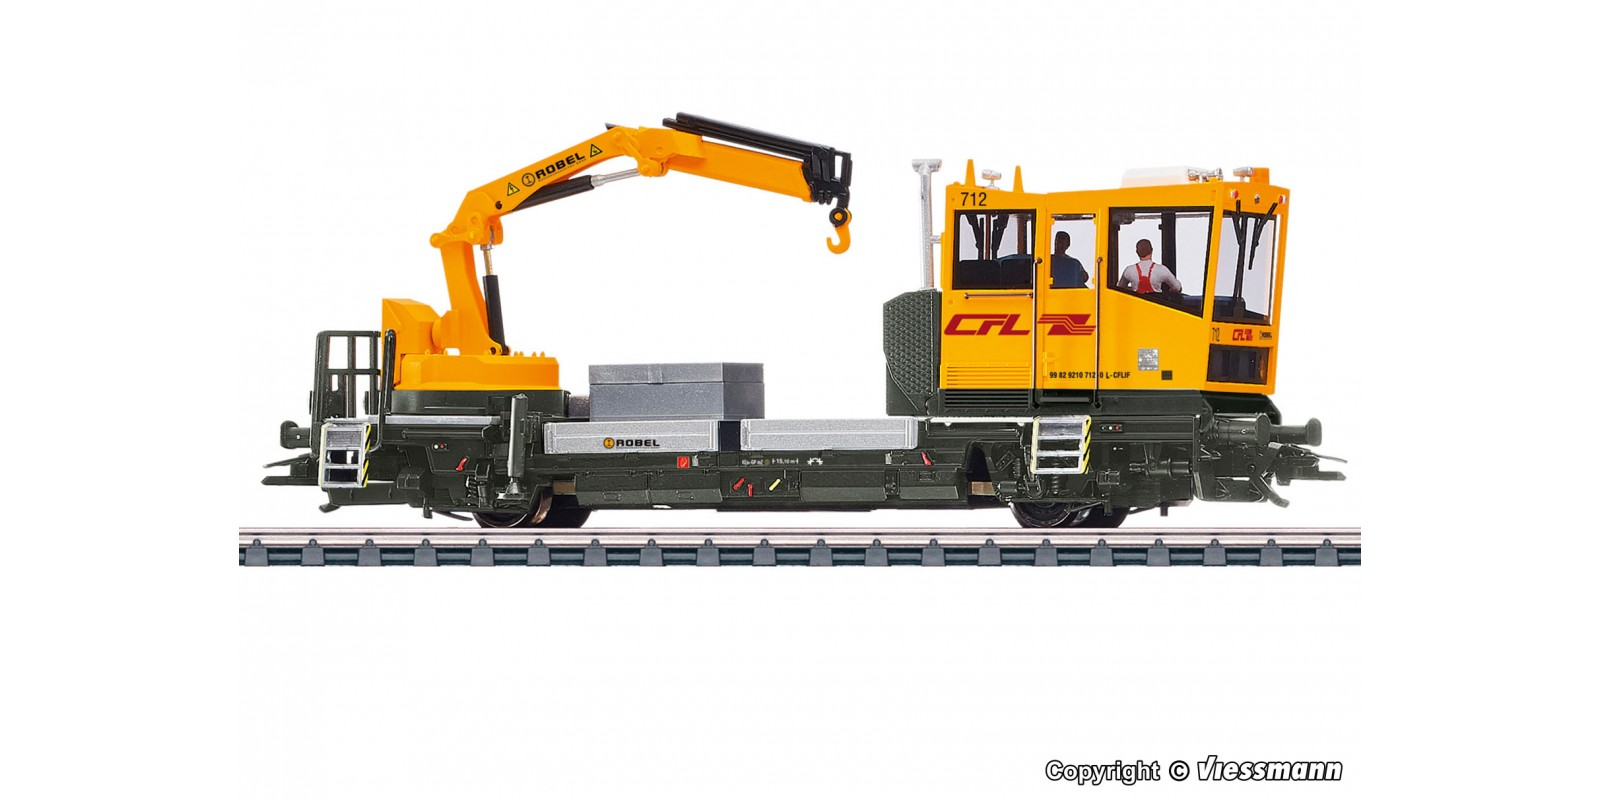 VI2628 H0 ROBEL track motor car 54.22 CFL version with motorized crane, functional model, 2 rail version